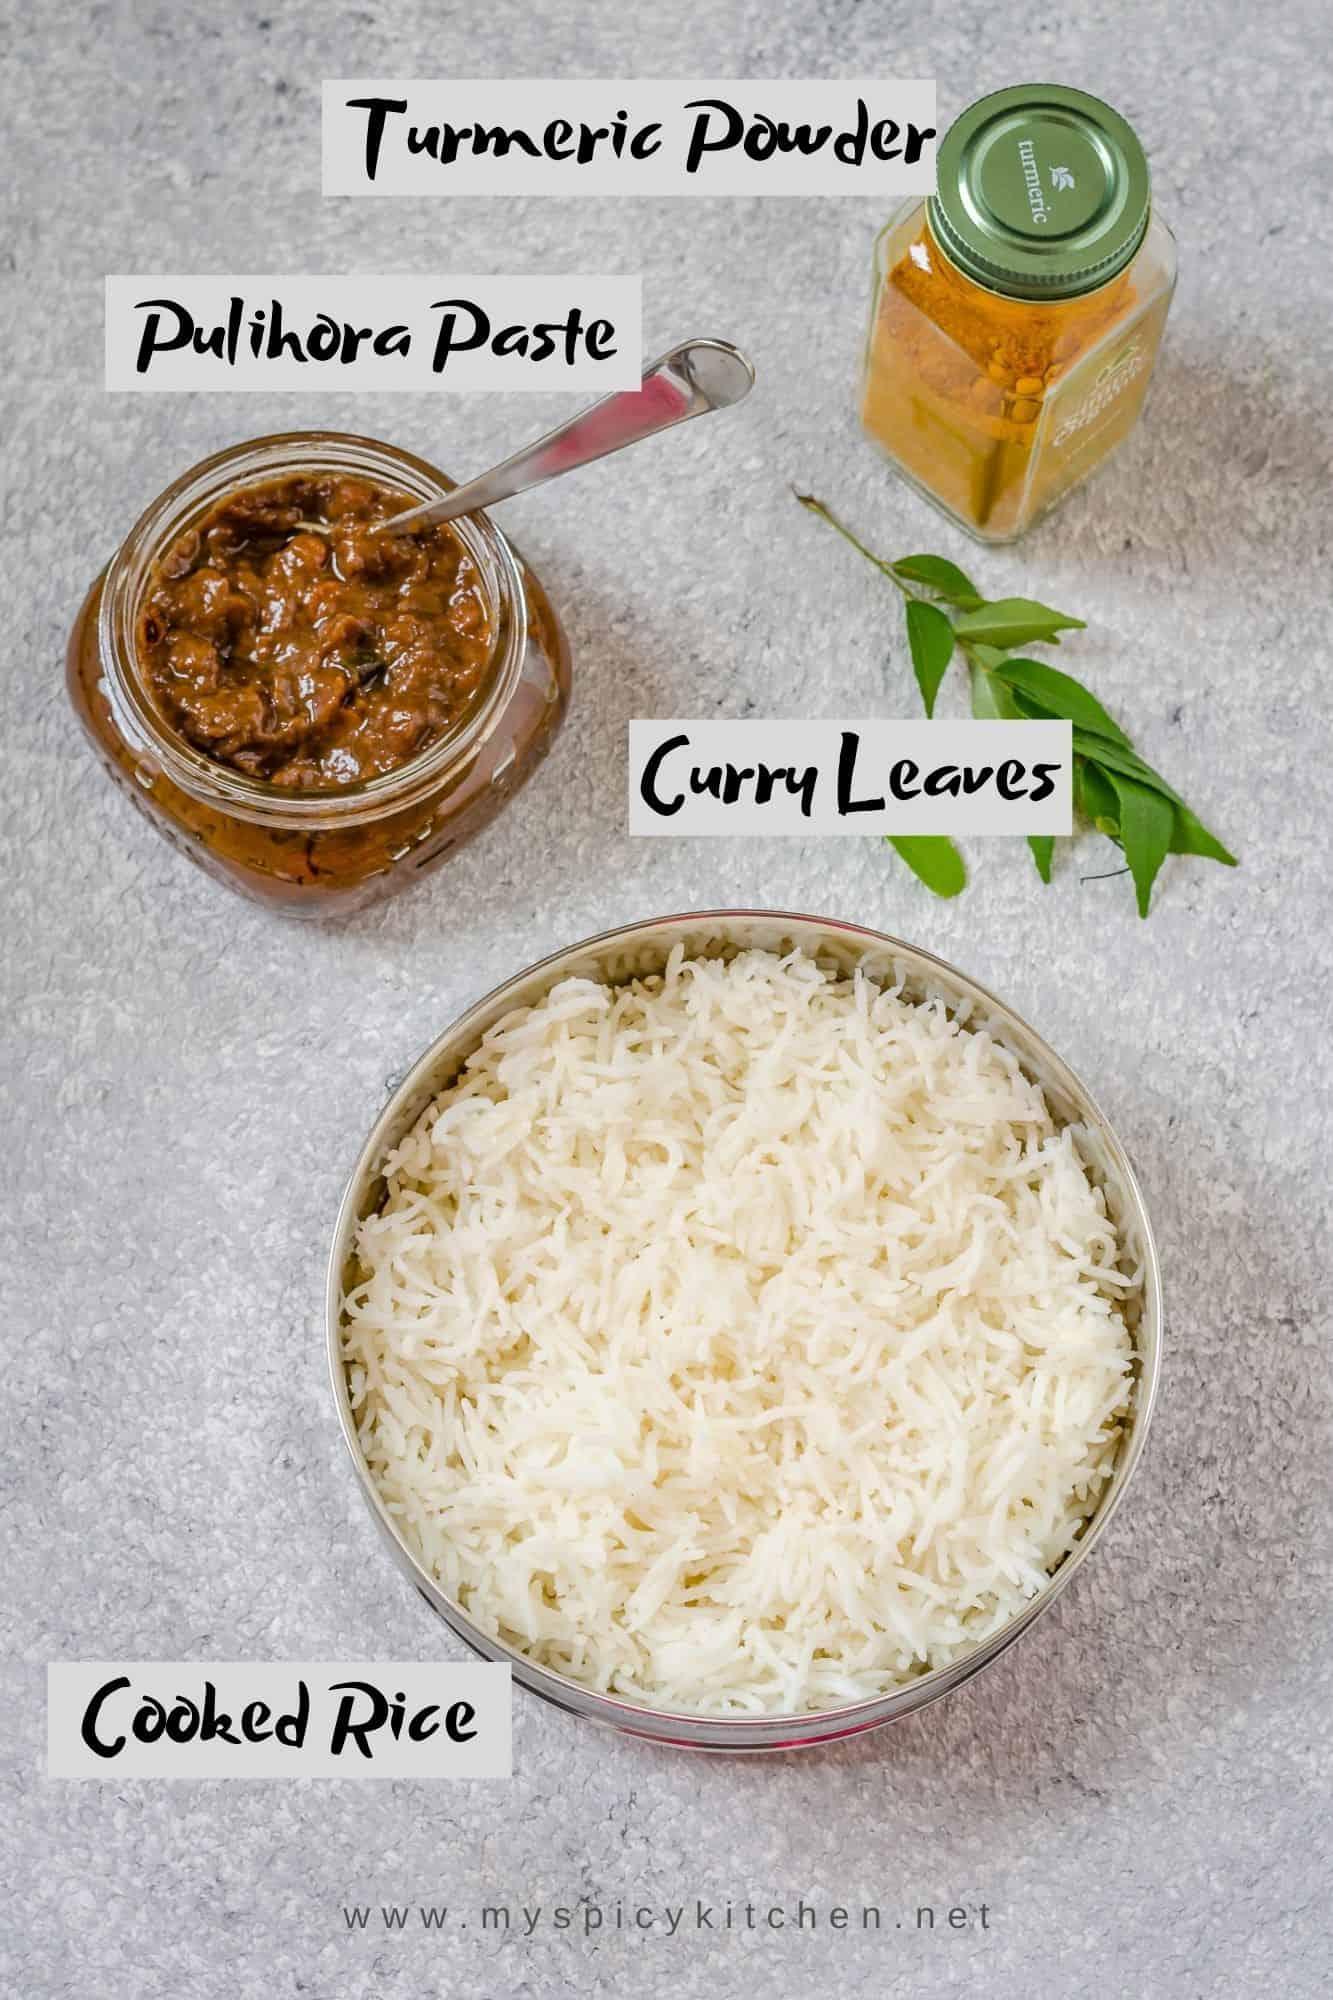 Ingredients for tamarind rice - cooked rice, pulihora paste and turmeric powder.